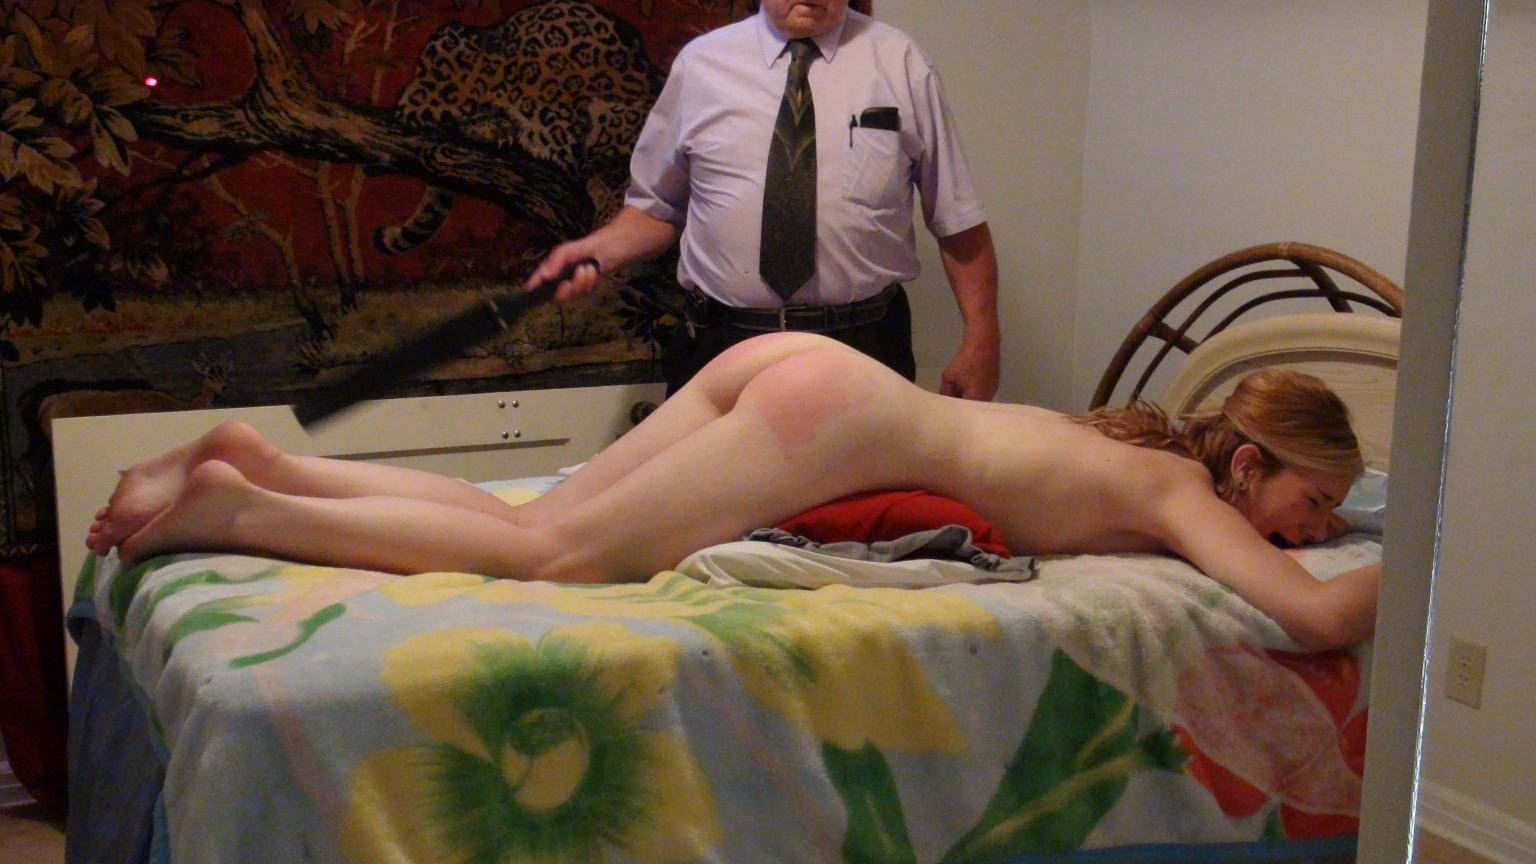 Housegirls spanked hard